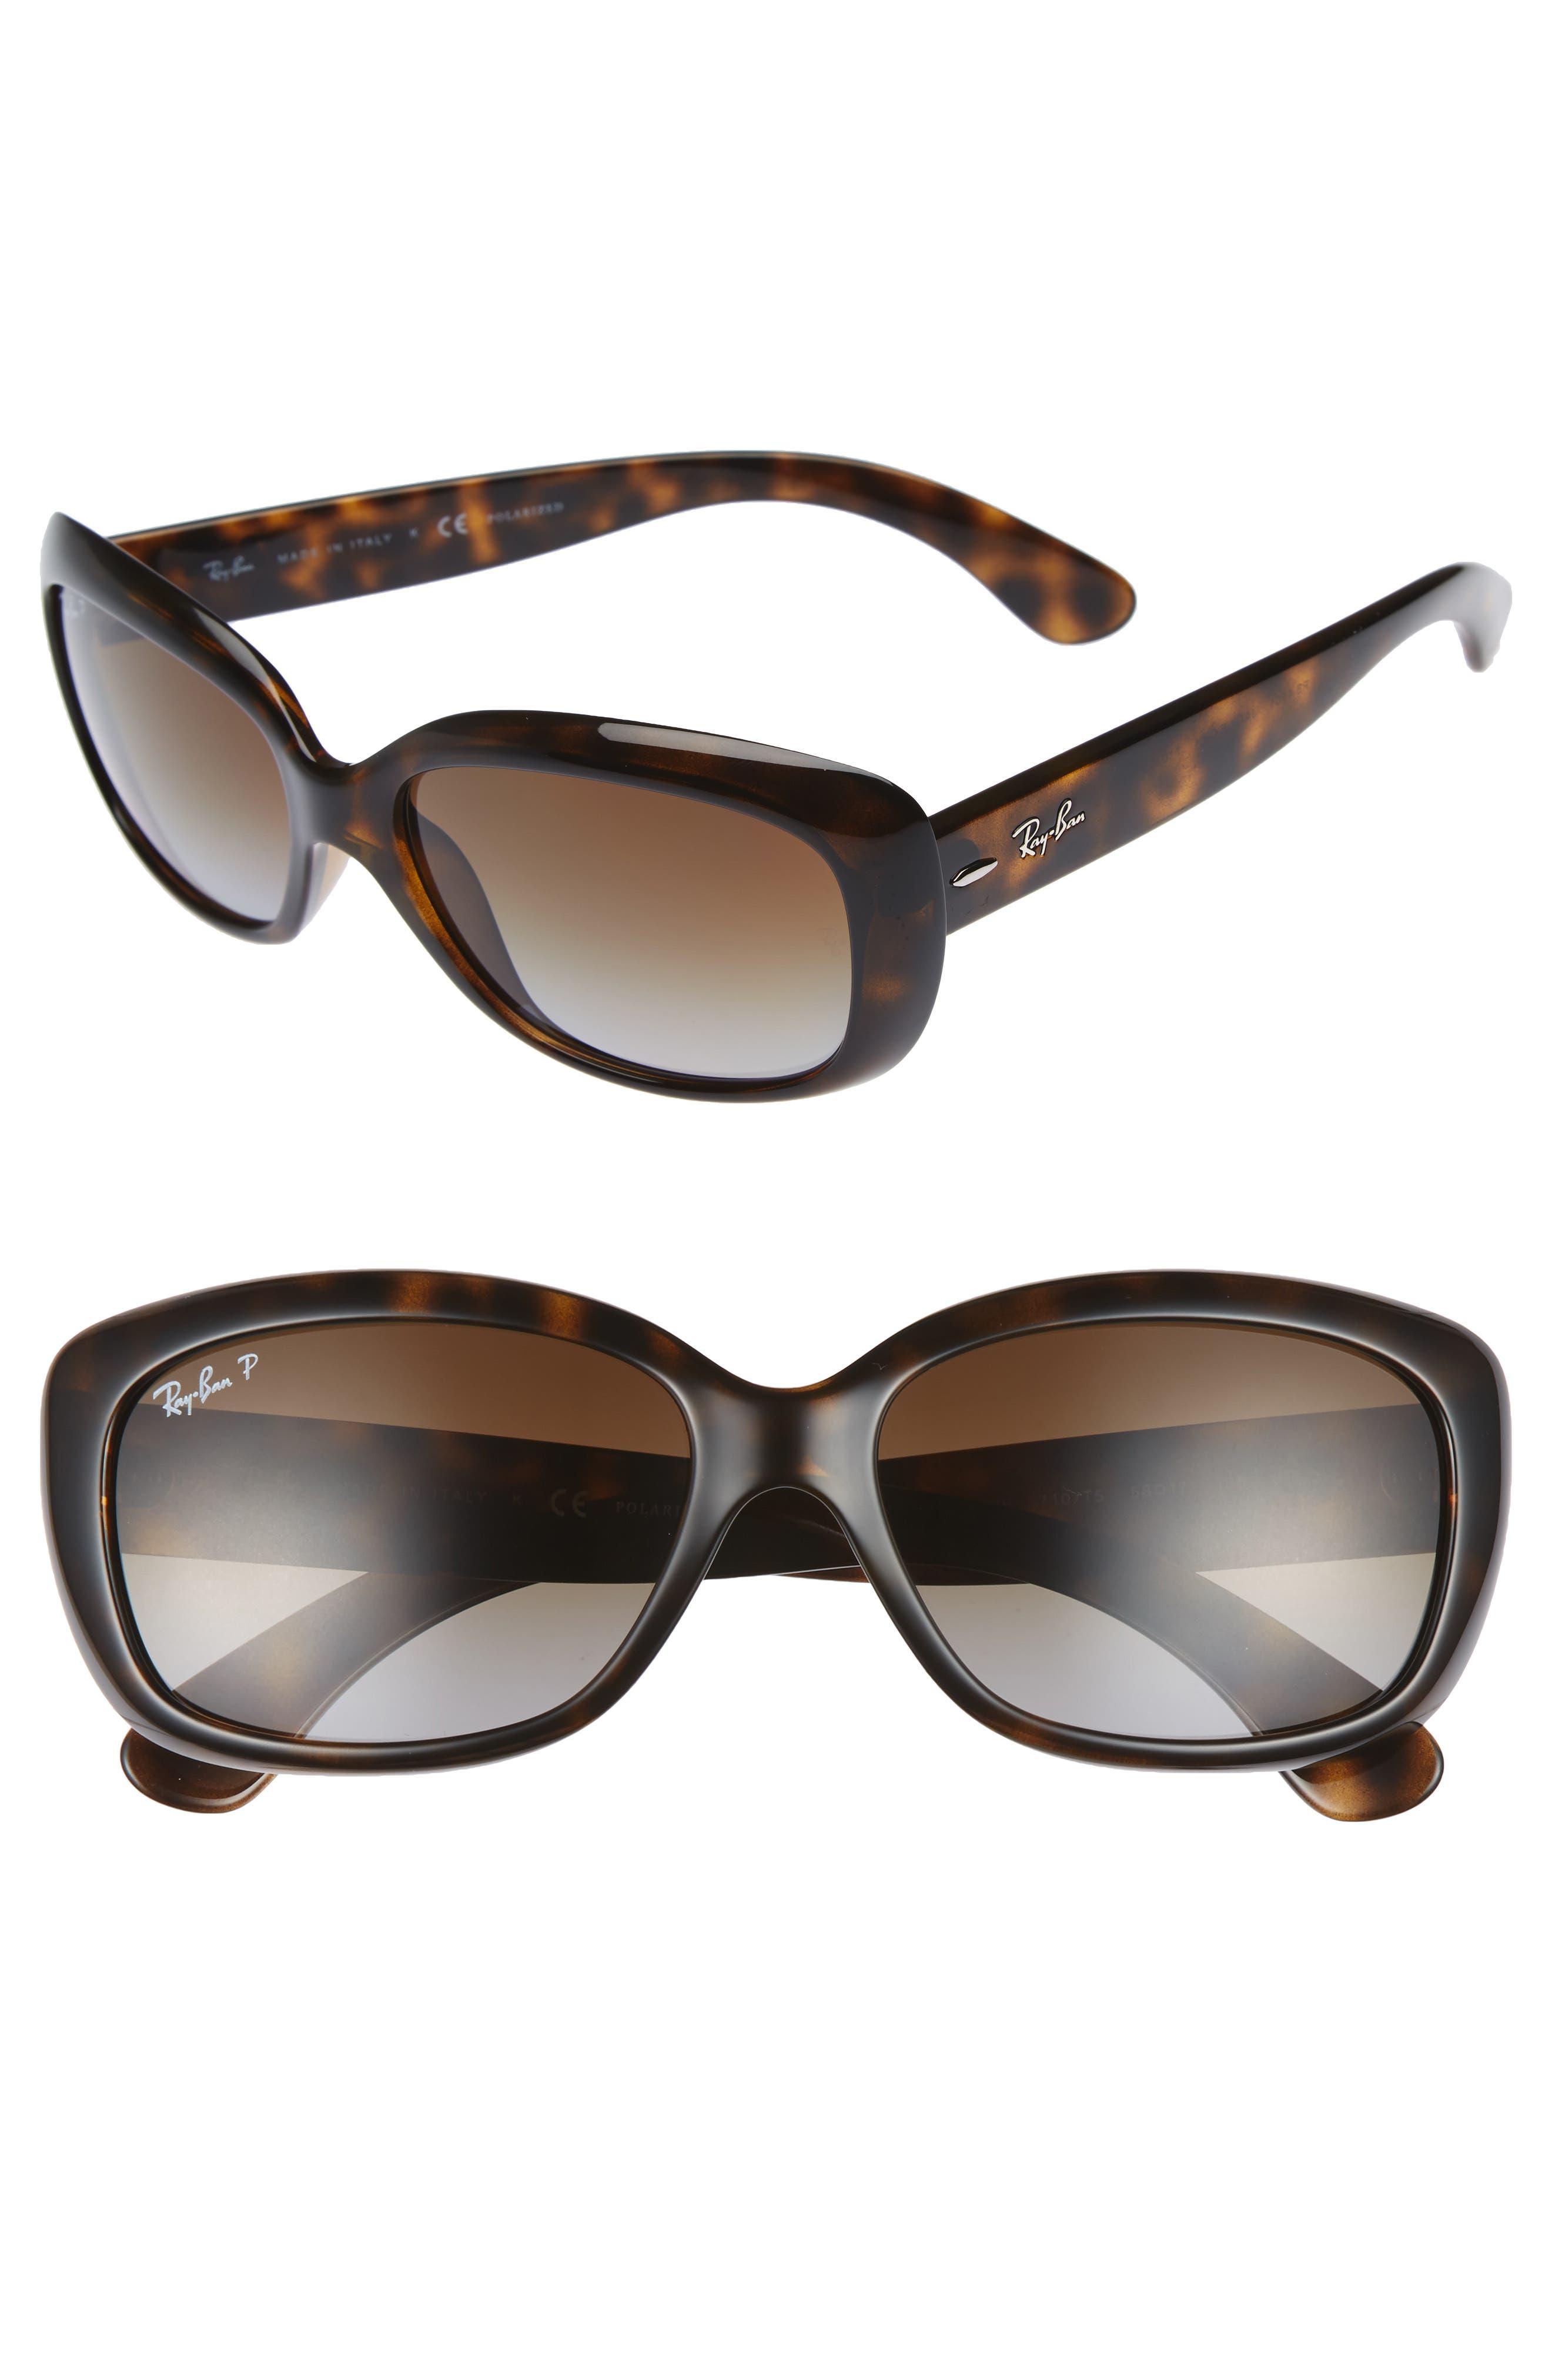 58mm Polarized Sunglasses,                         Main,                         color, Havana